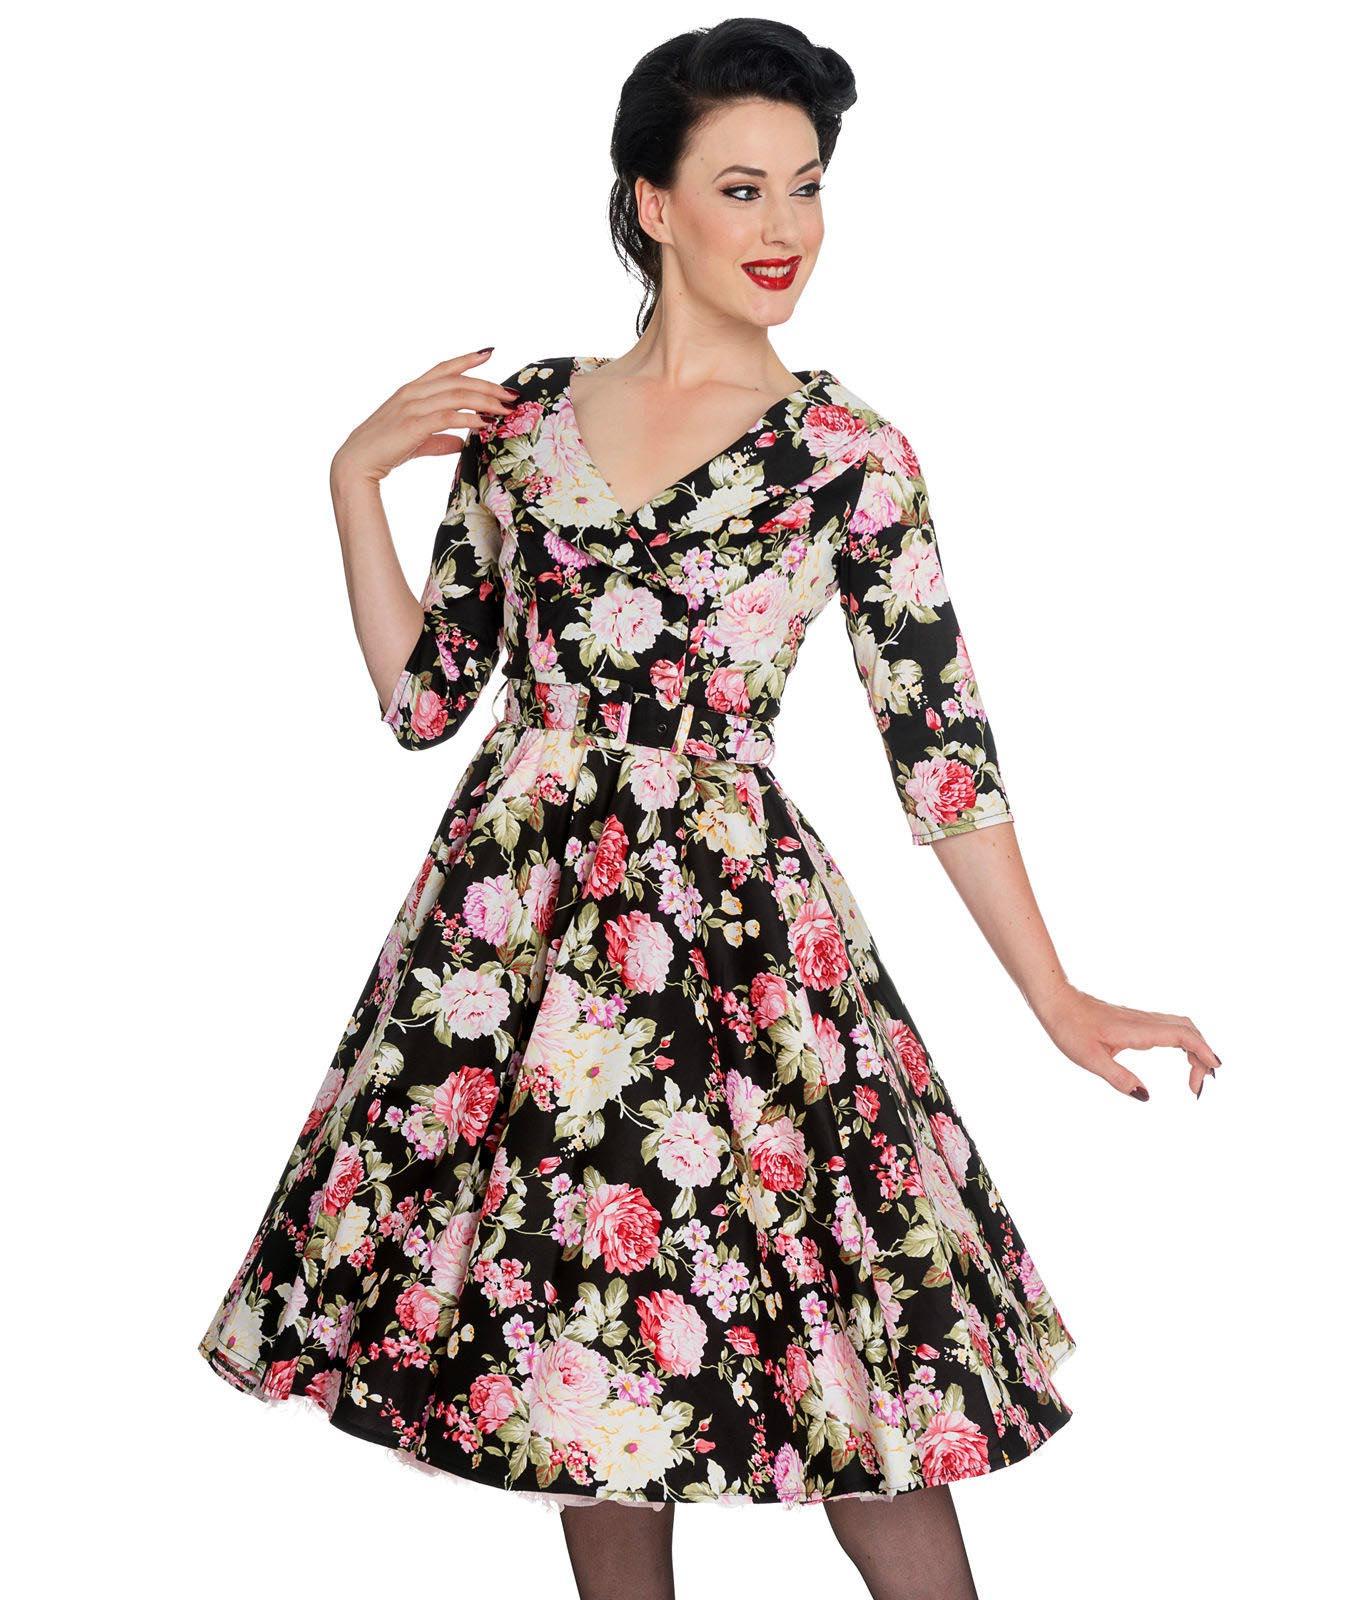 Hell-Bunny-40s-50s-Black-Pin-Up-Swing-Dress-DAHLIA-Pink-Flowers thumbnail 3